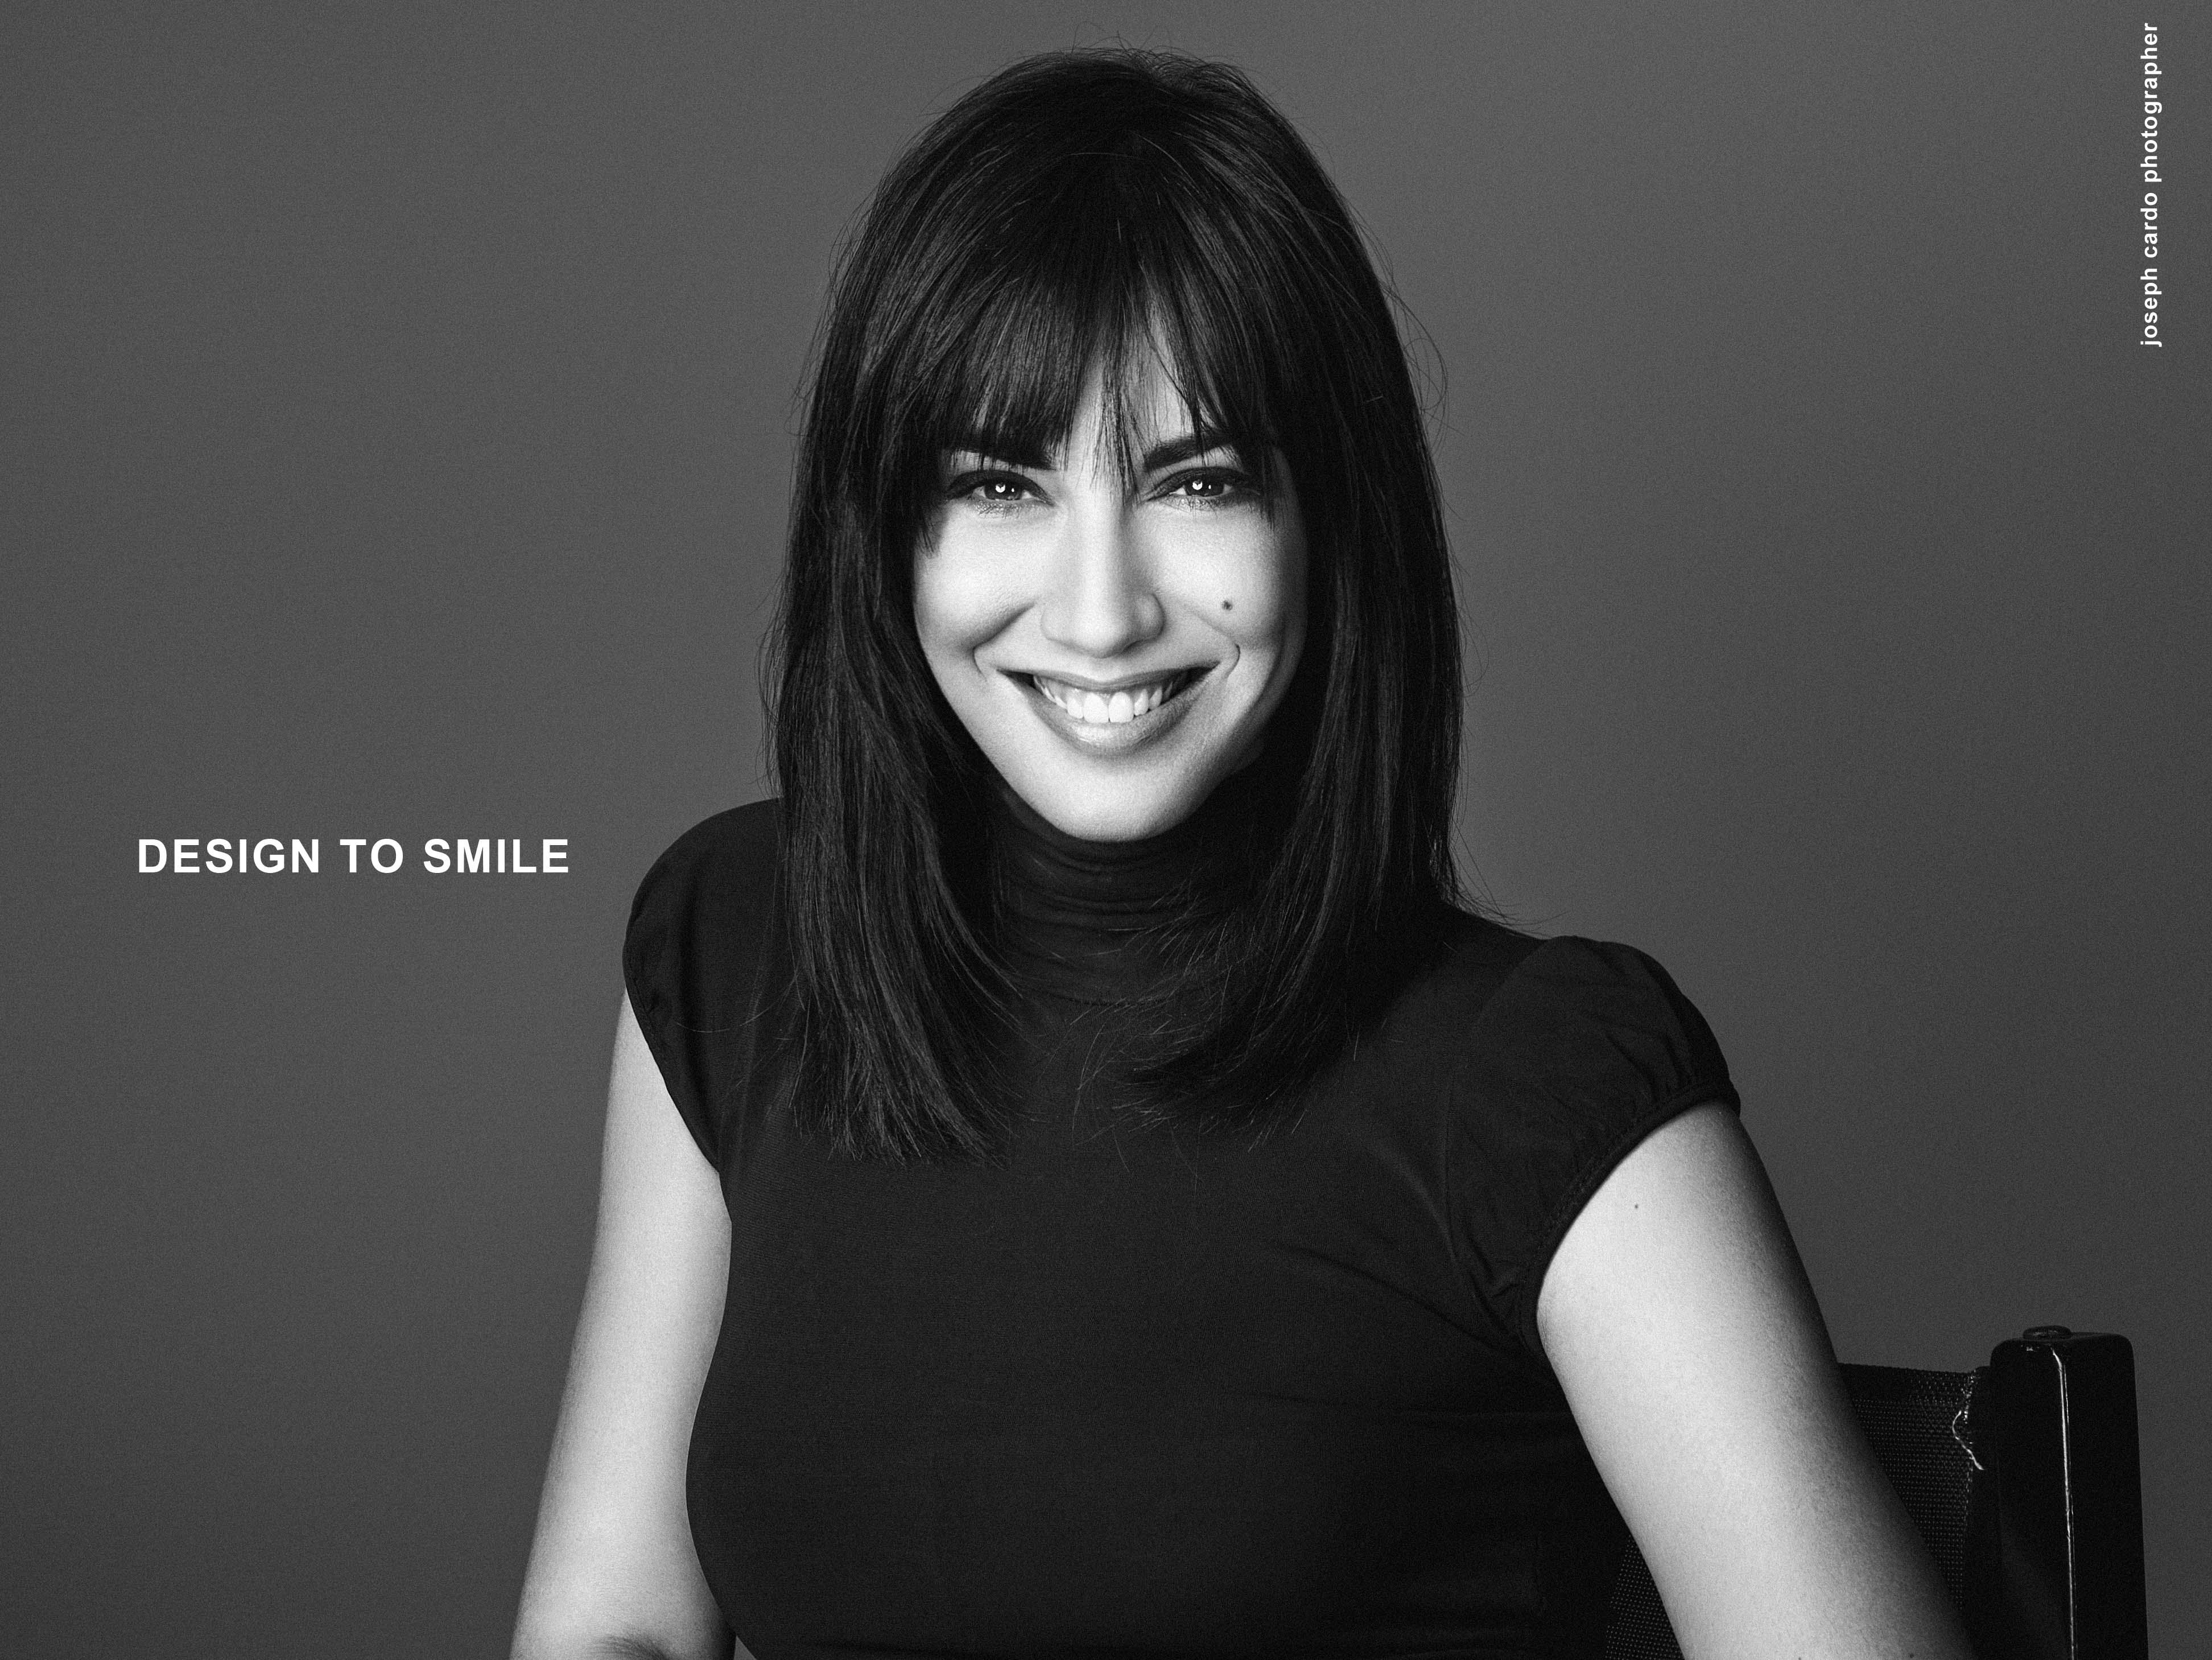 design-to-smile